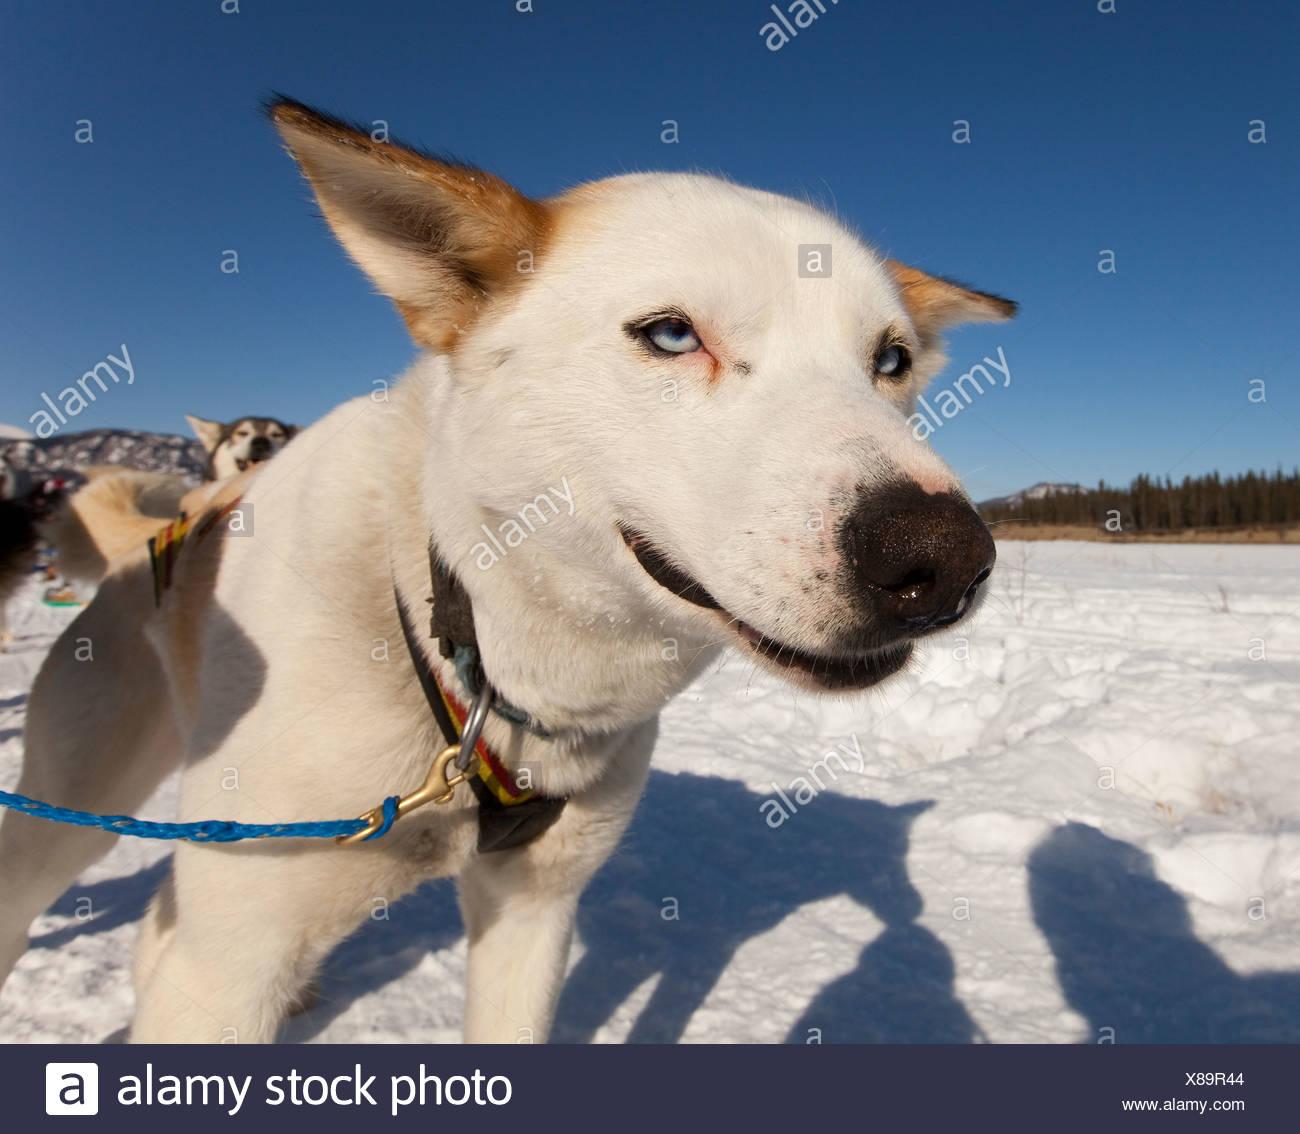 Ritratto di Sled Dog, cane piombo, Alaskan Husky, congelati Yukon River, Yukon Territory, Canada Immagini Stock